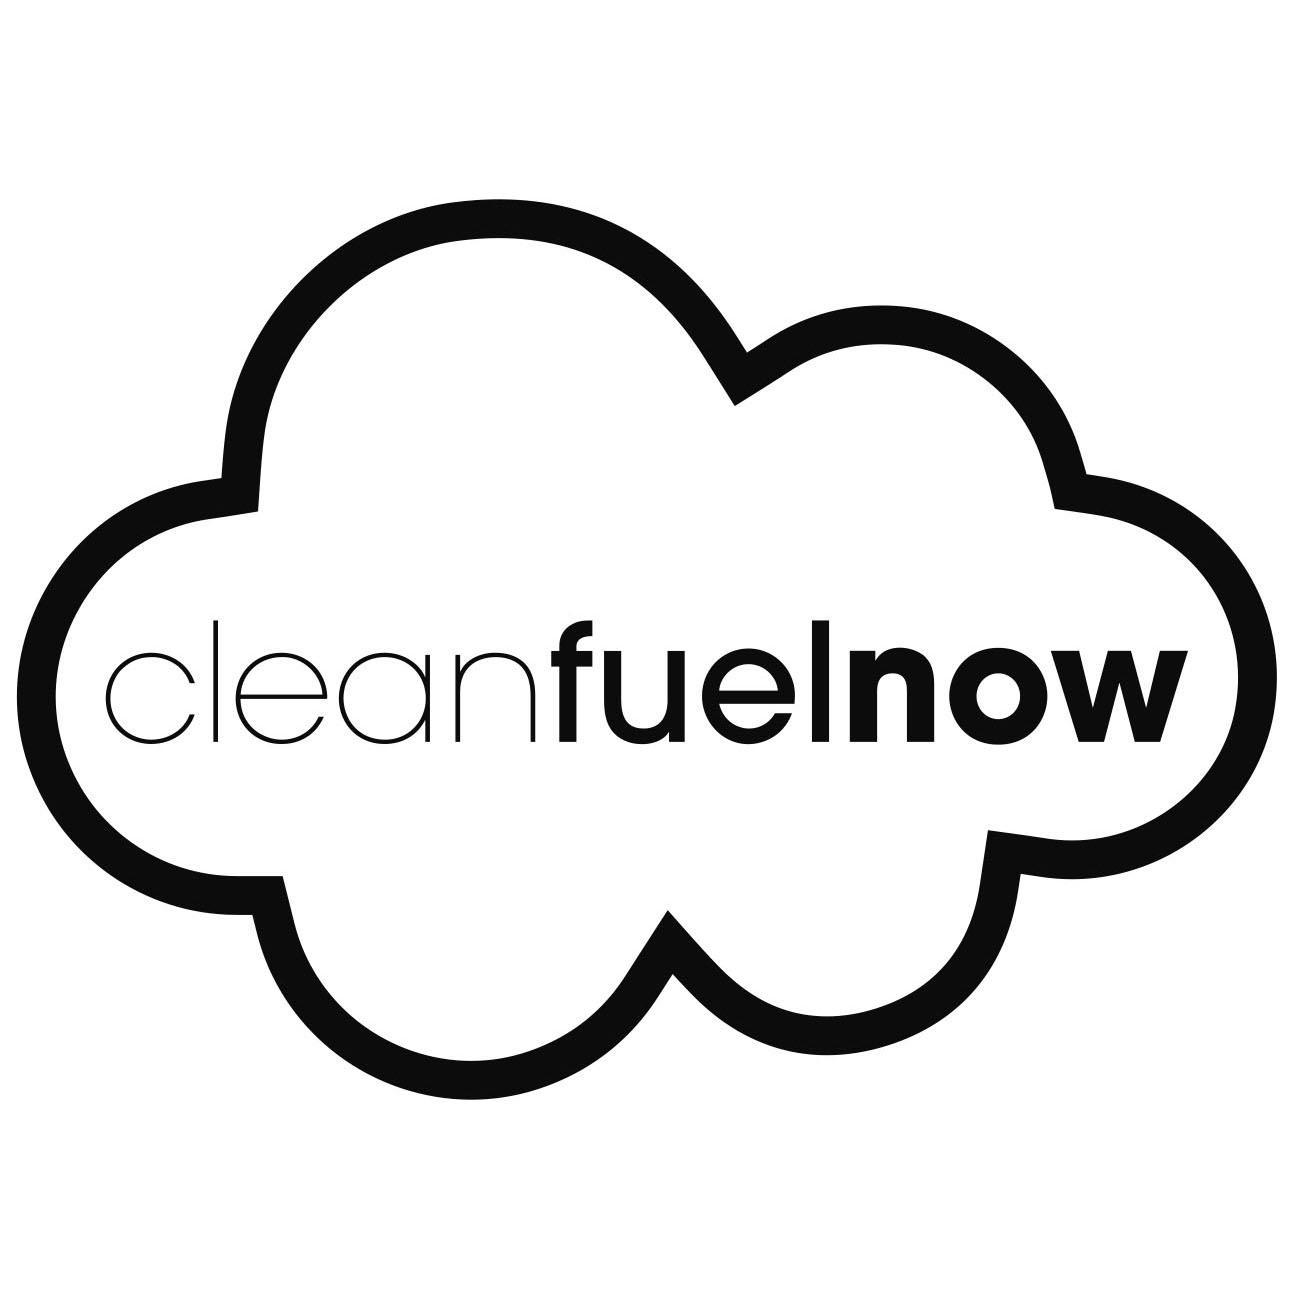 Clean Fuel Now Cleanfuelnow